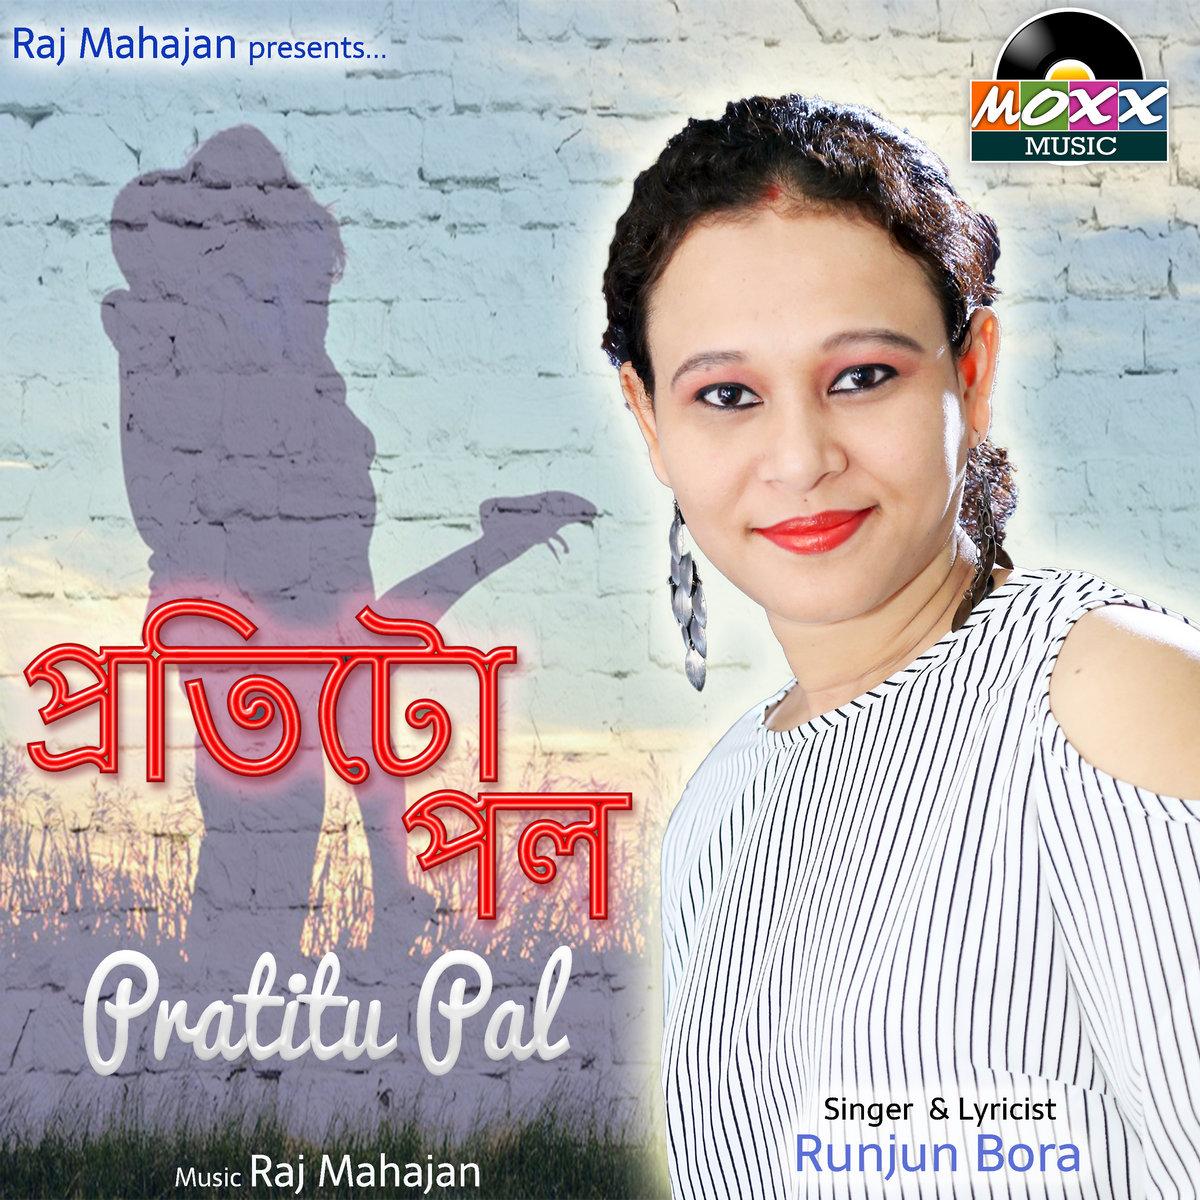 Diljale khiladi thiri 2019 hindi dubbed full movie watch online hd.